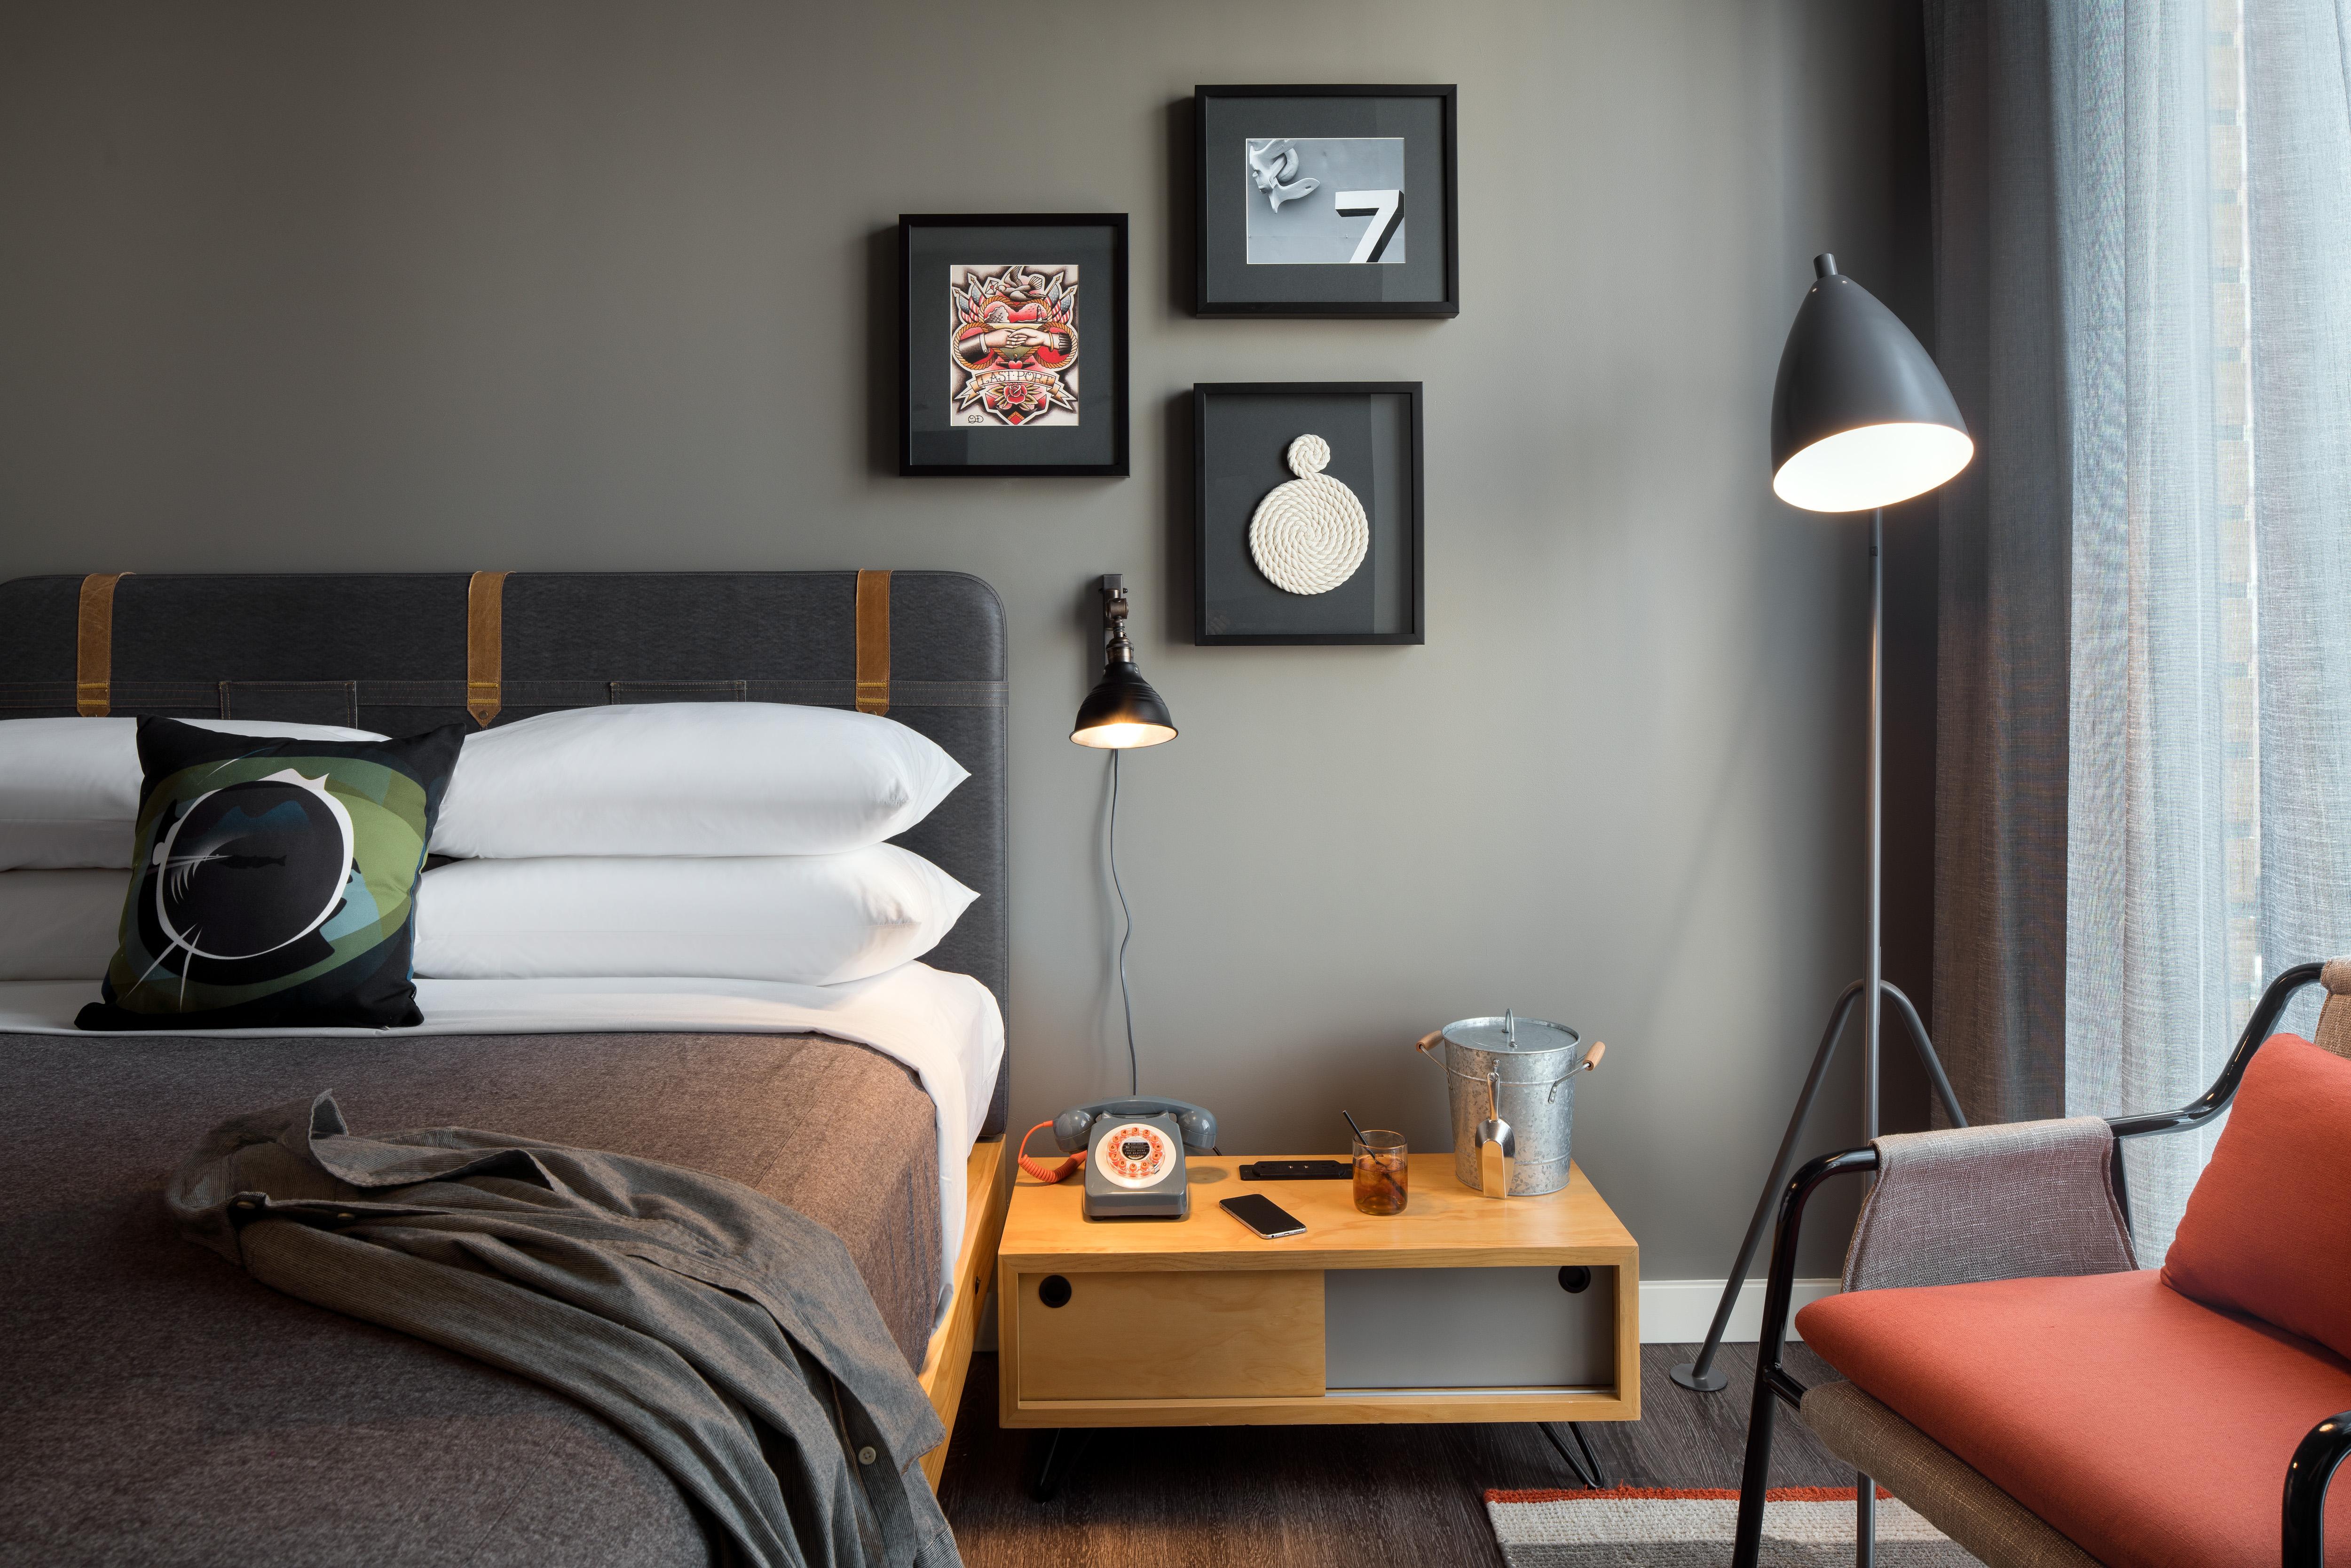 ox_sanox_guestroom_details